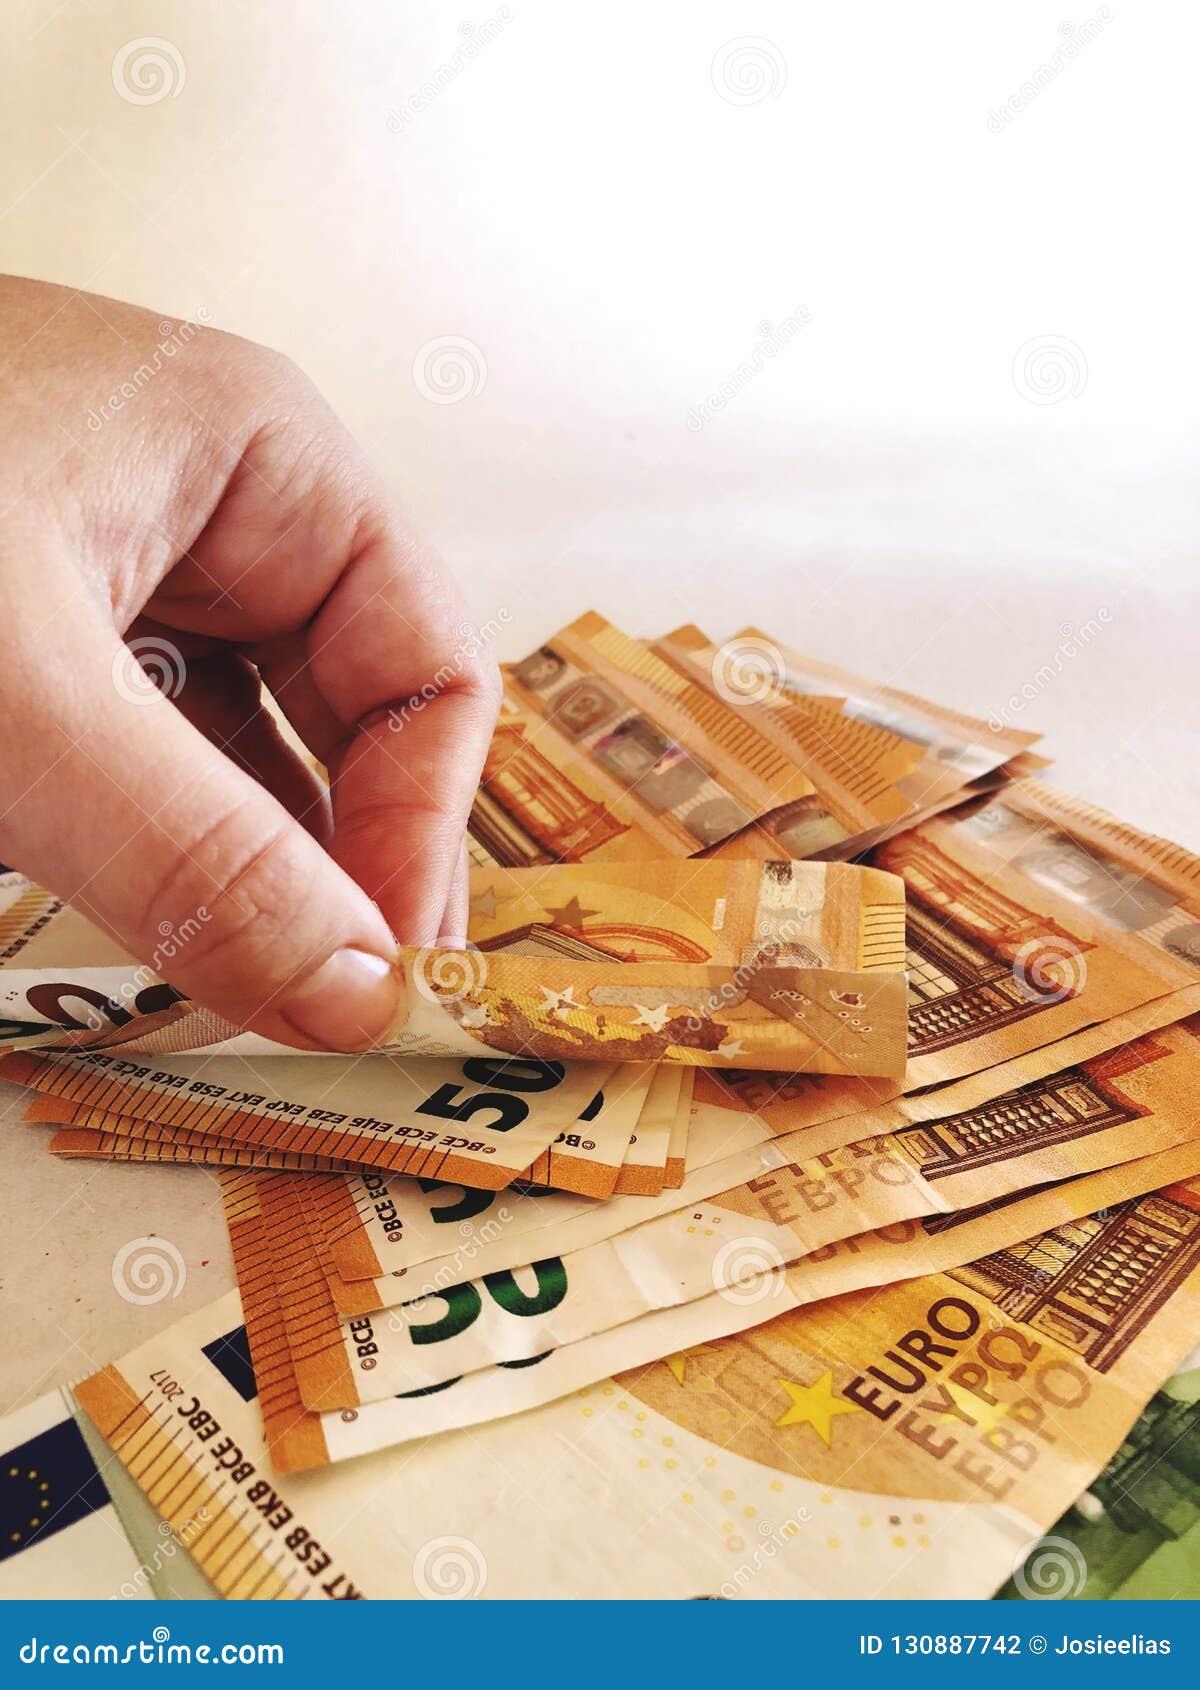 Hand en stapel van bankbiljetten â '¬50